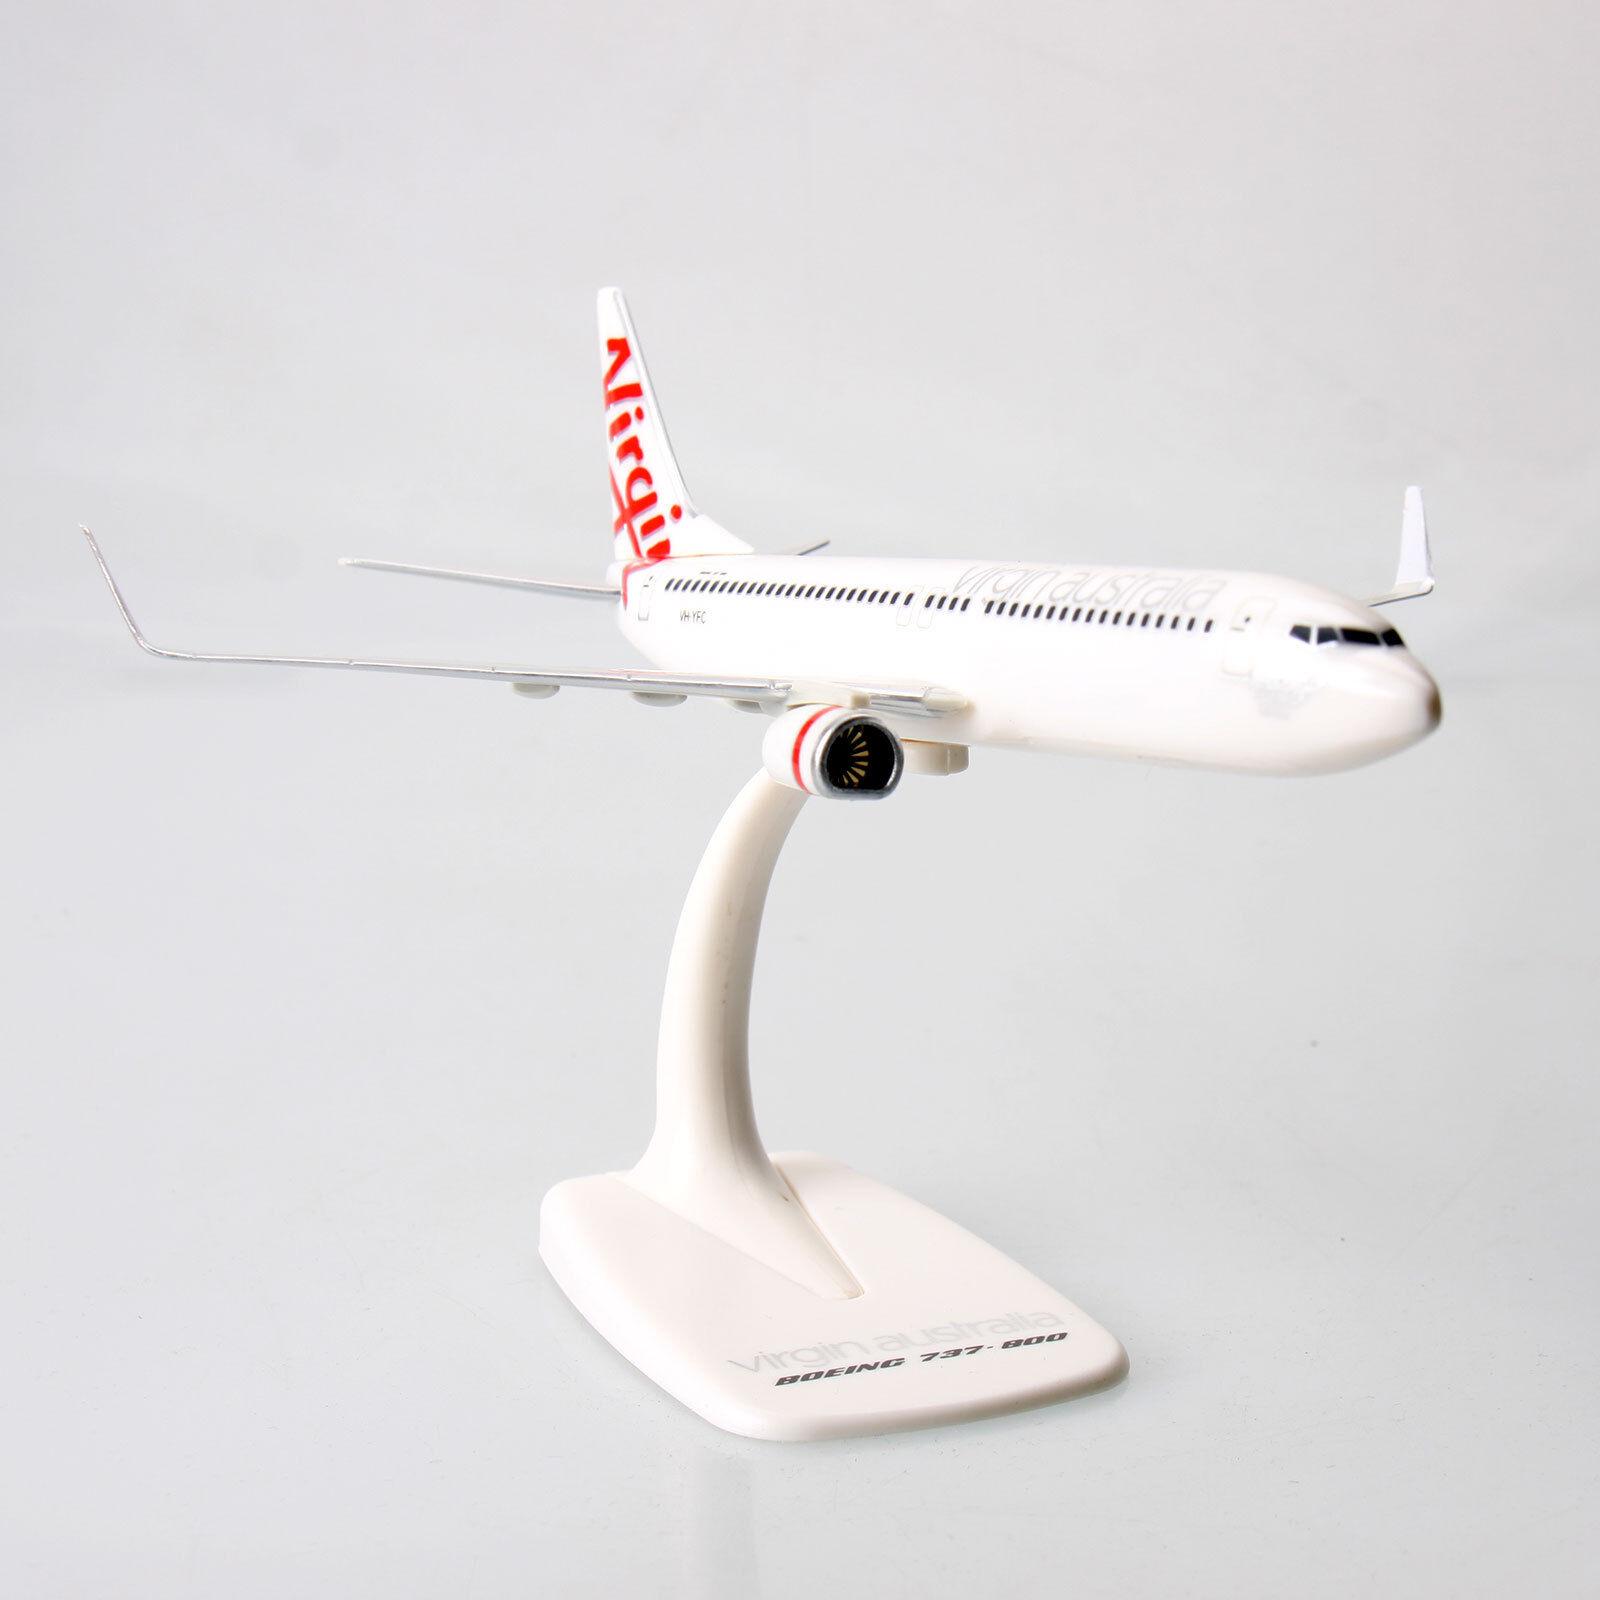 Virgin Australia Boeing B737-800 1 200 Scale Solid Plastic 737 Model Aircraft